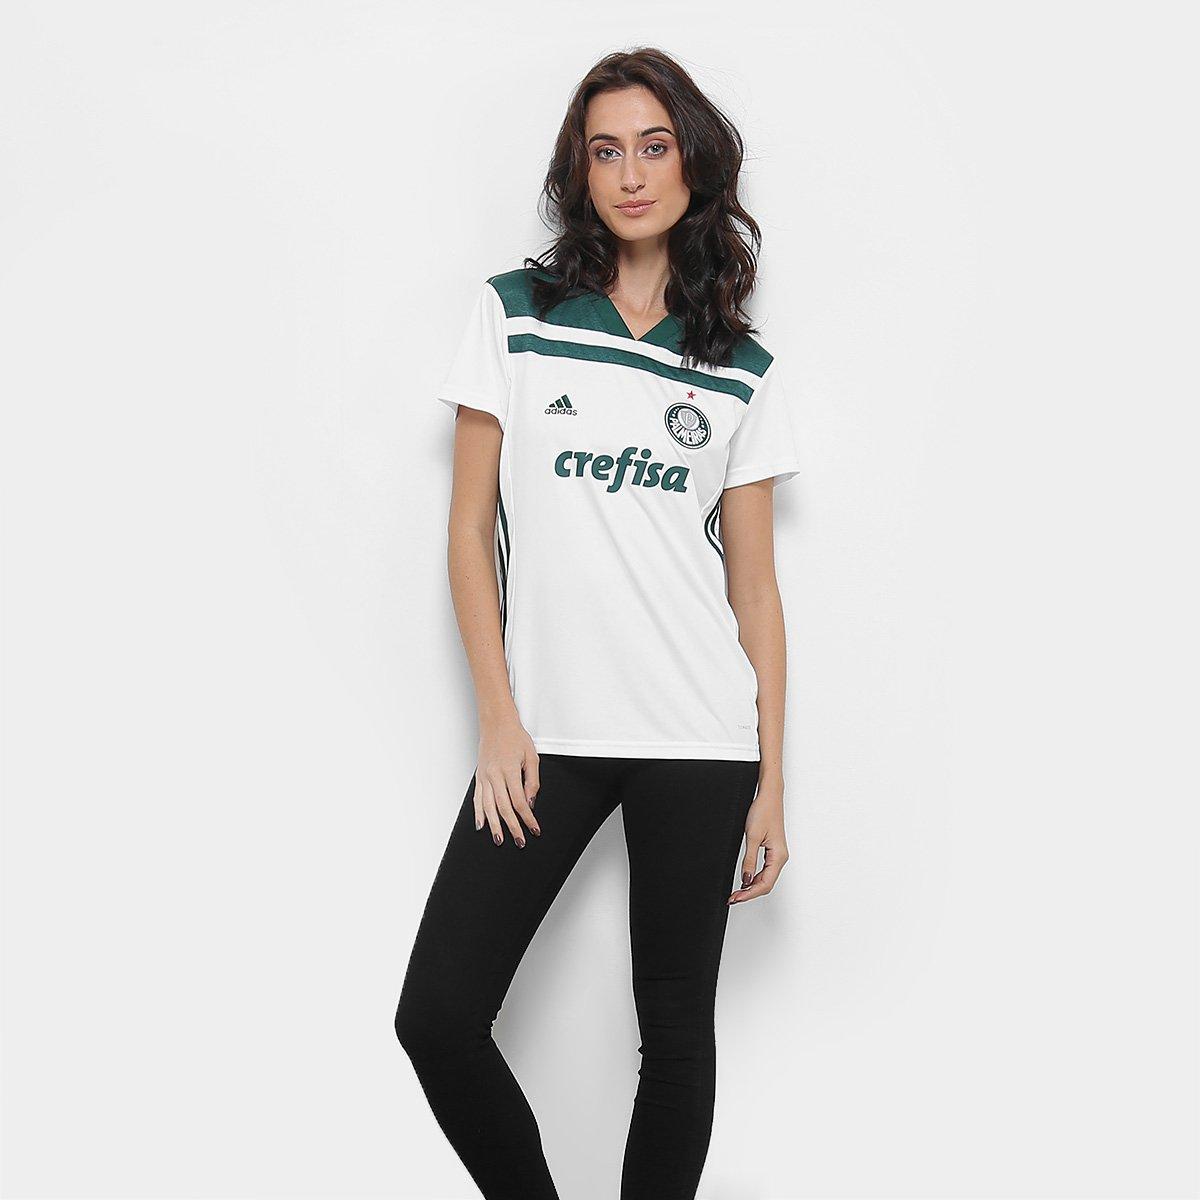 Adidas Torcedor 2018 Verde Palmeiras Branco Feminina n° II Camisa e s YwfT1CYq